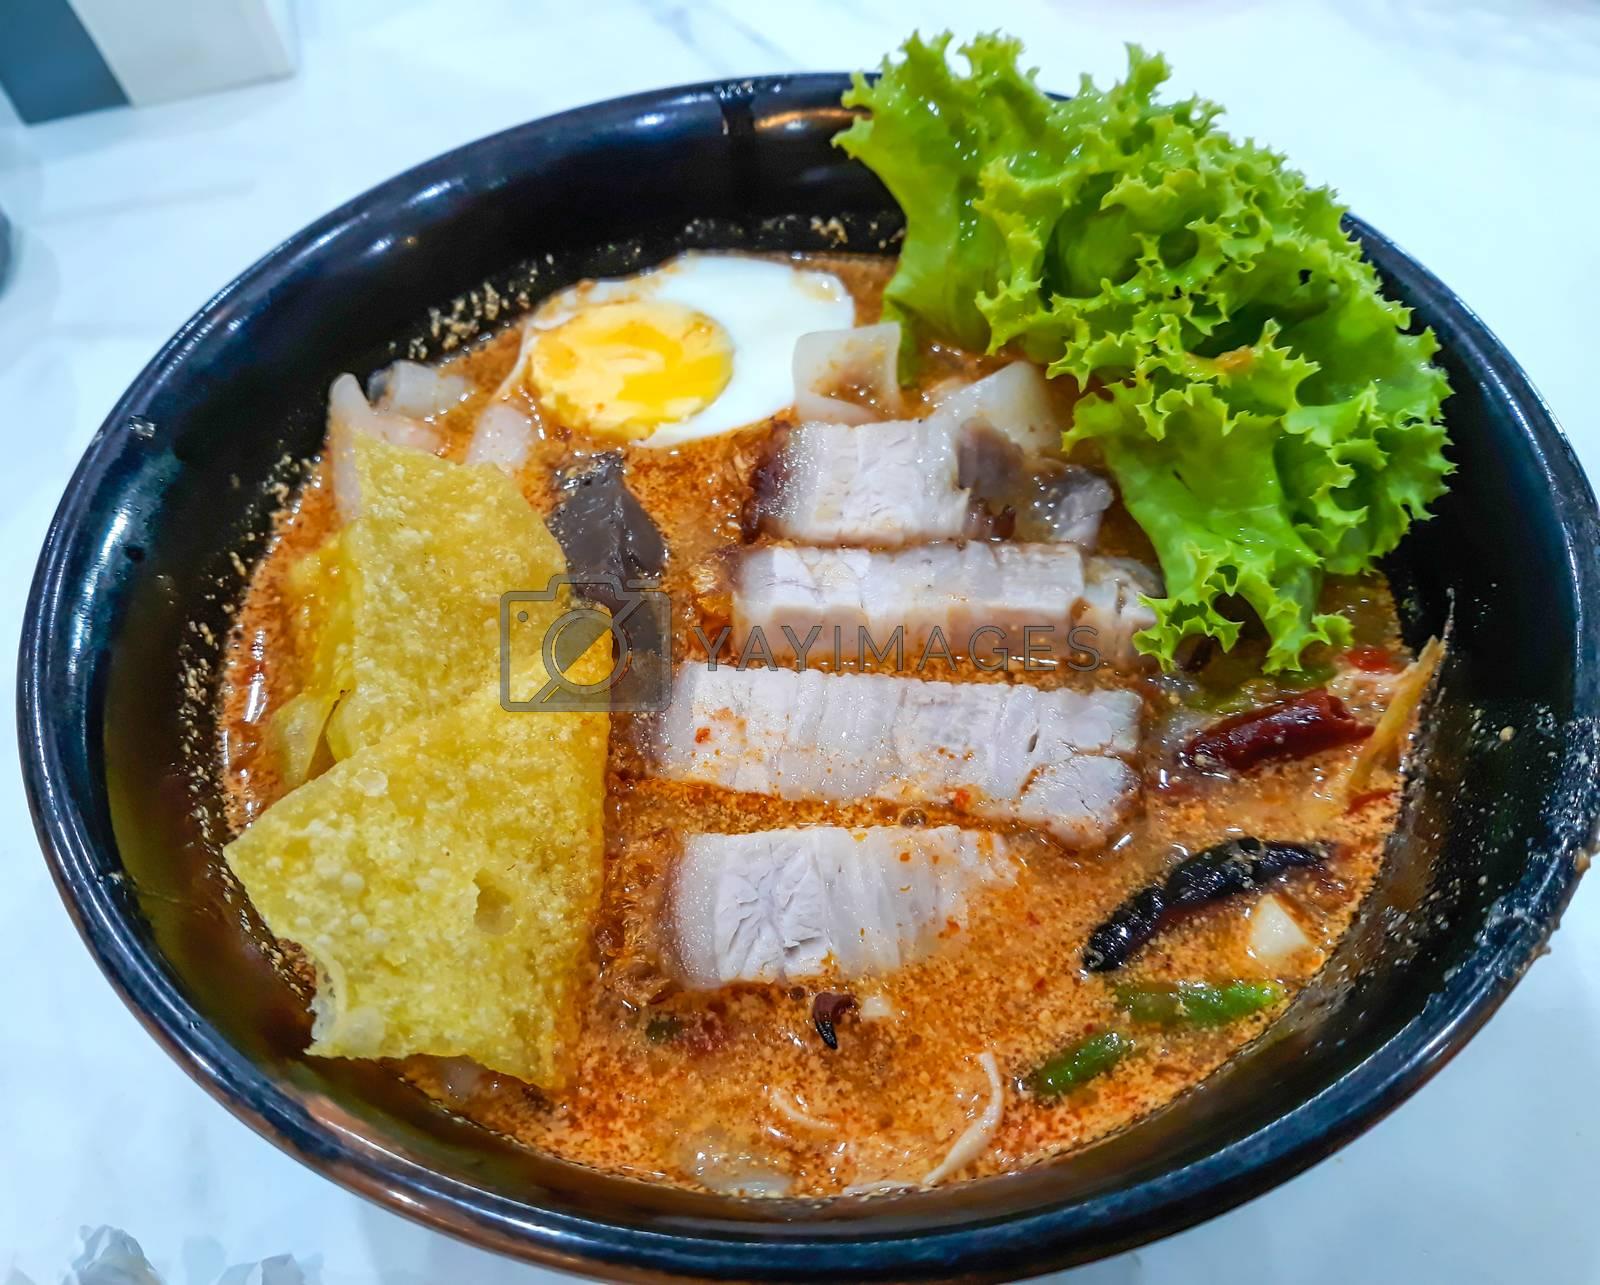 Spicy noodle with  crispy pork ,Thai food. by Nunnicha Supagrit